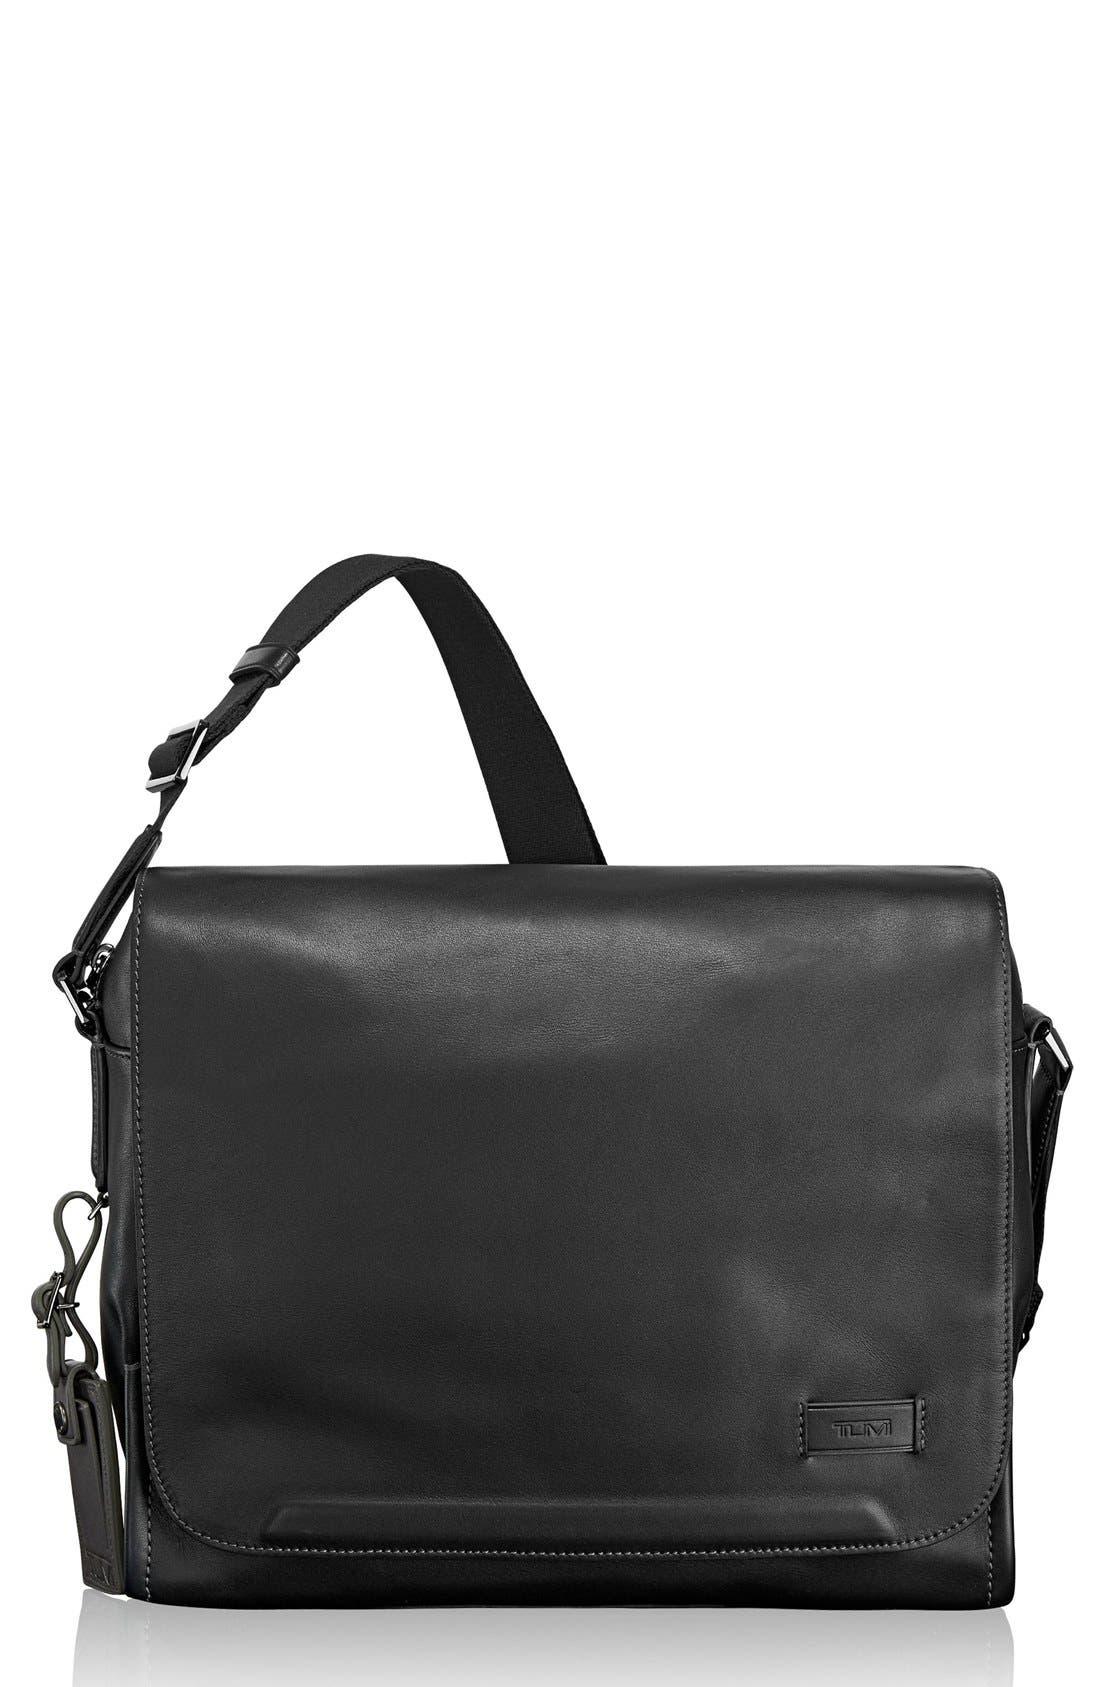 Tumi 'Arrivé - Davenport' Messenger Bag